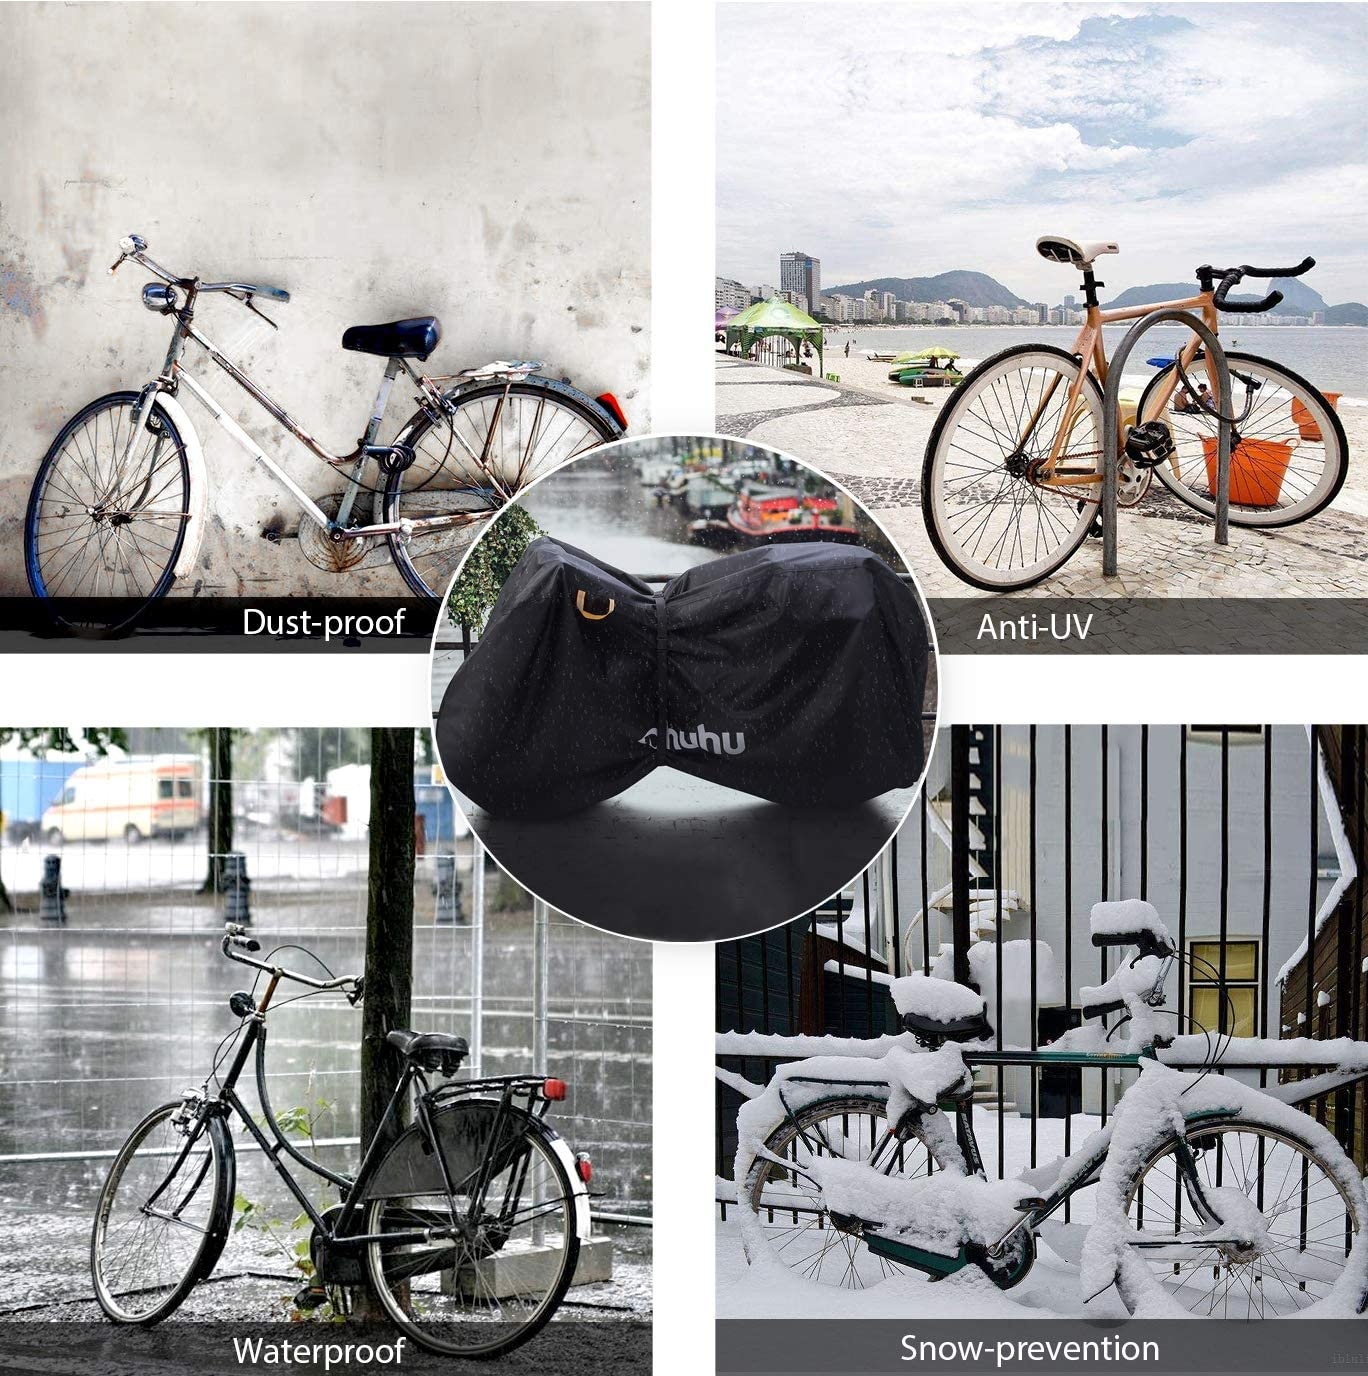 Super Amos Cubrezapatos T/érmico Impermeable A Prueba de Viento Chanclos Protector MTB Bicicleta de Monta/ña